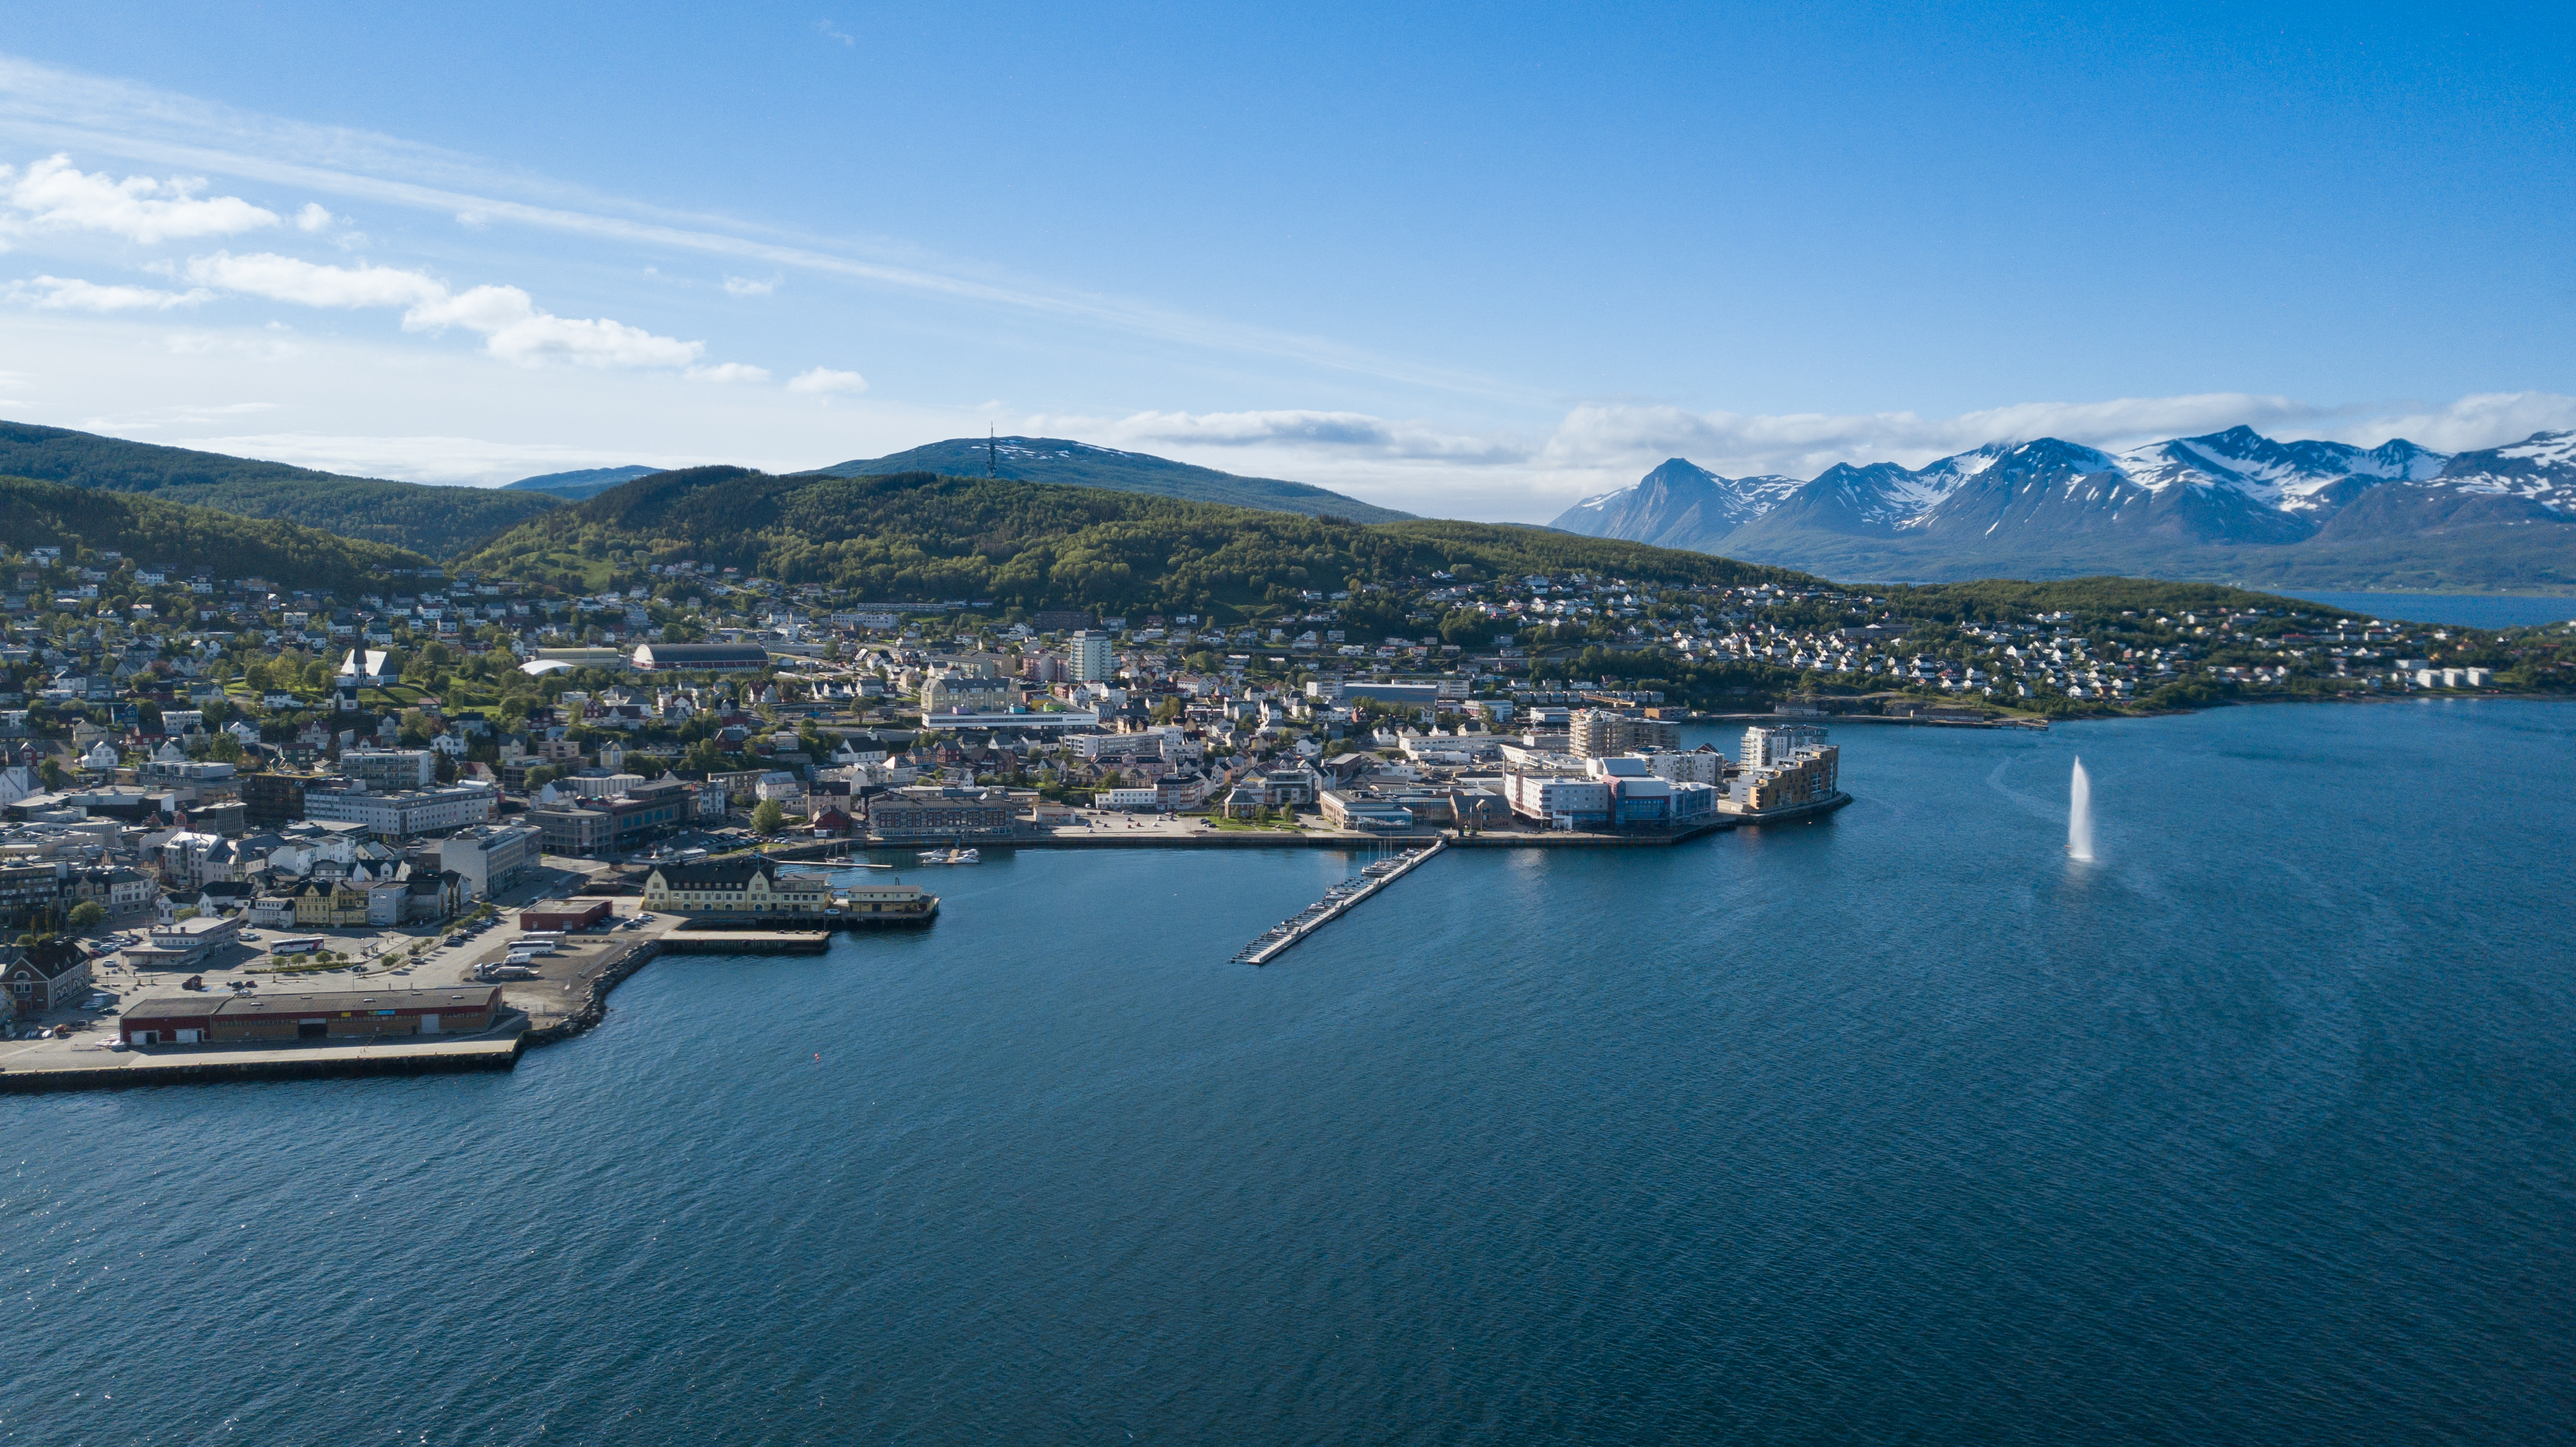 gáivuotna kåfjord speed dating norway dating site i fossbergom